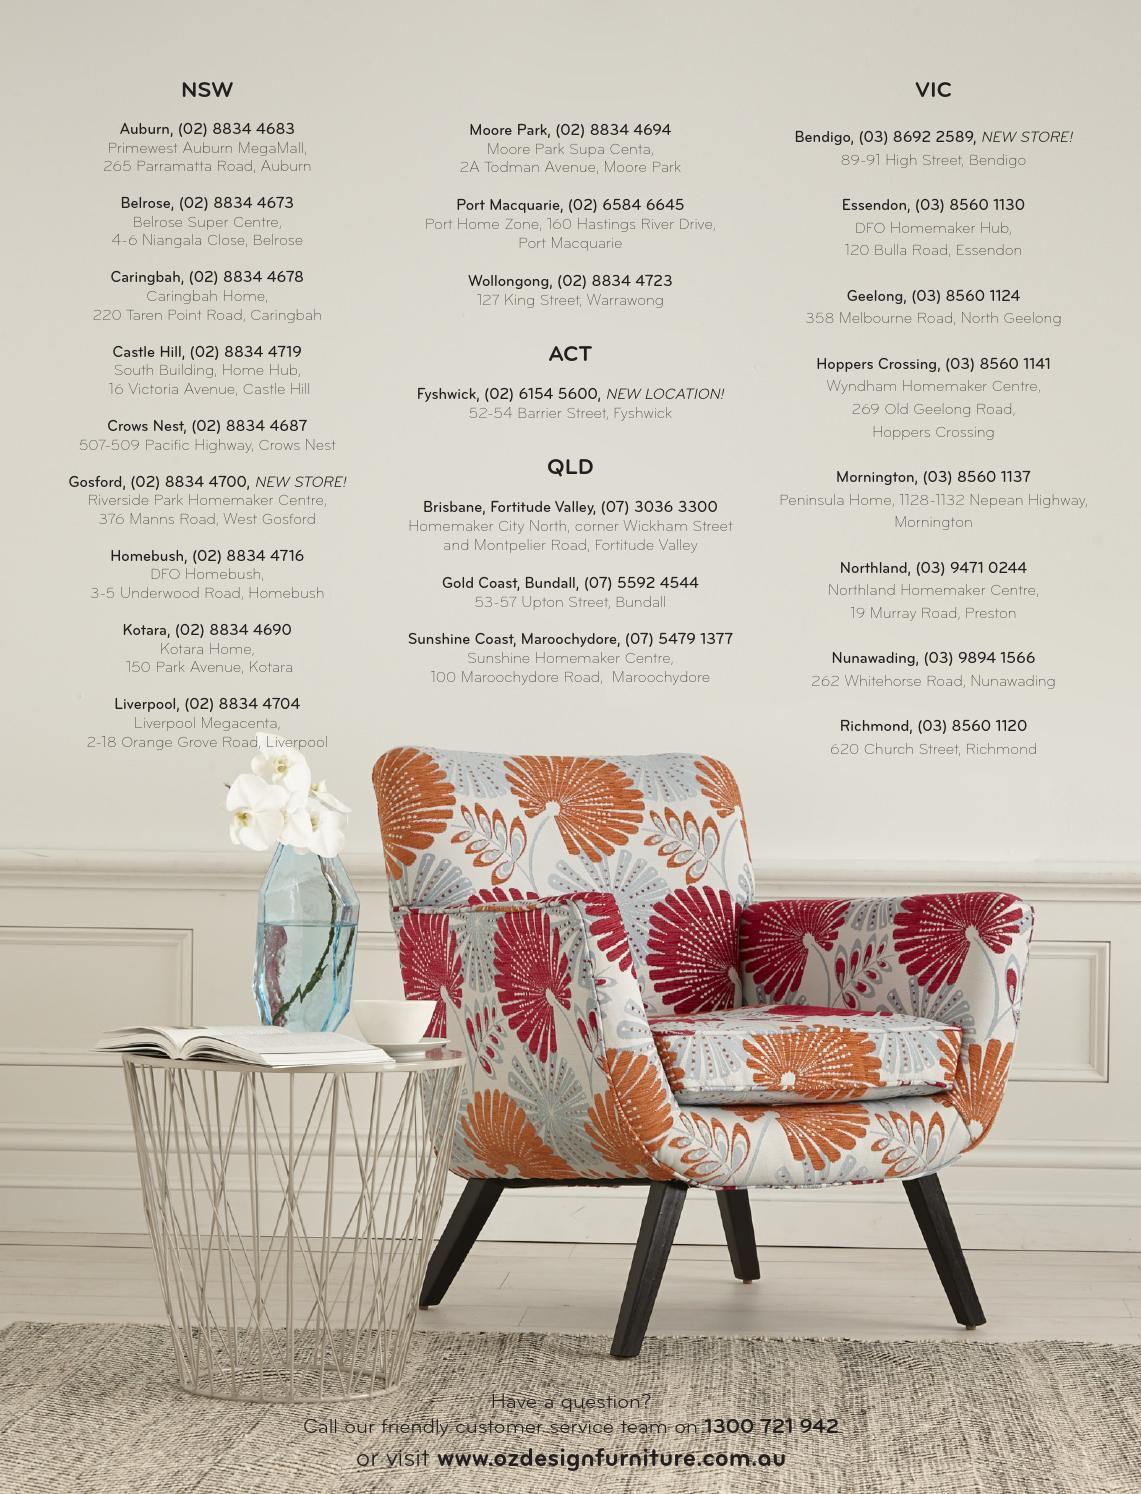 Oz design furniture summer 15 16 directory by oz design furniture issuu